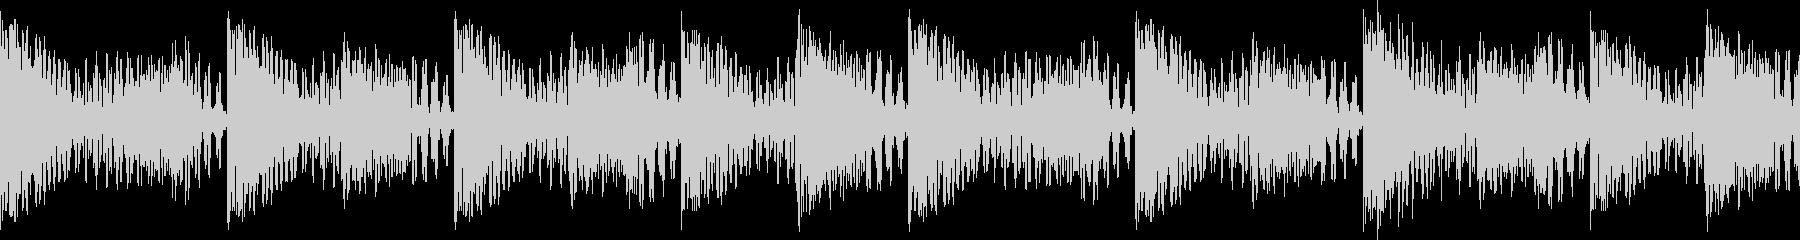 BPM128EDMリズムループキーF# の未再生の波形